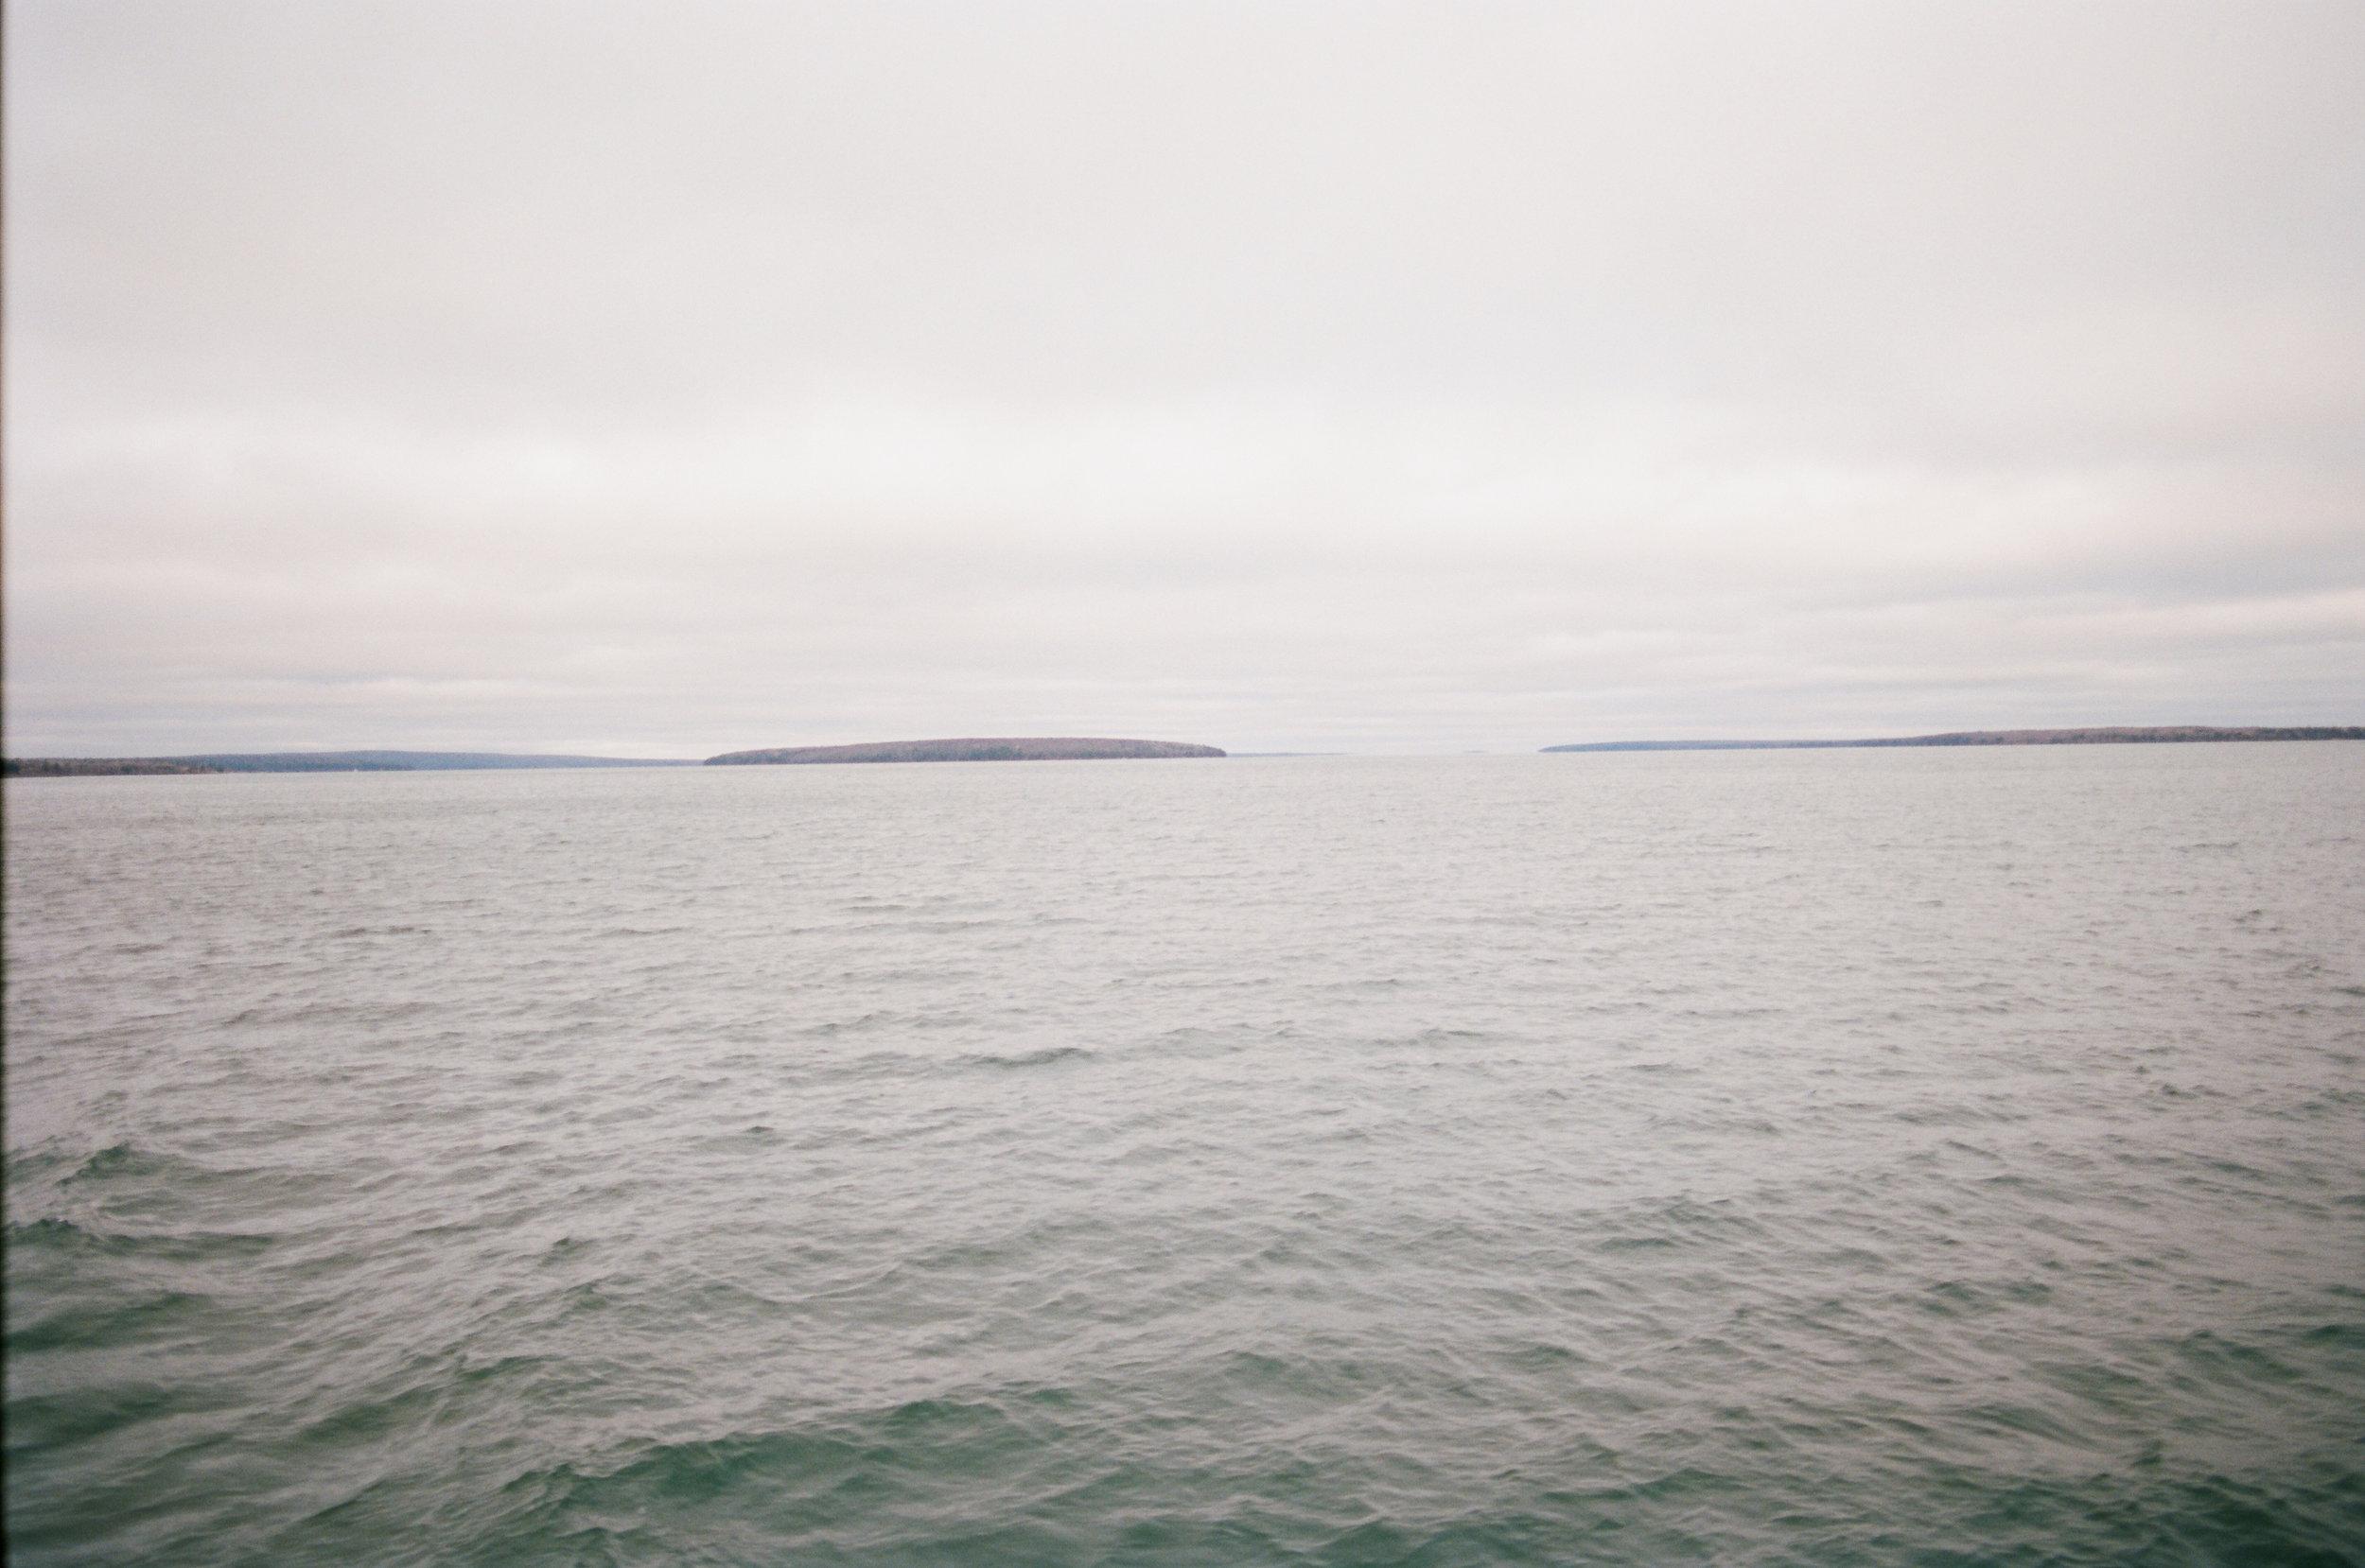 Lake Superior Adventure Photographer